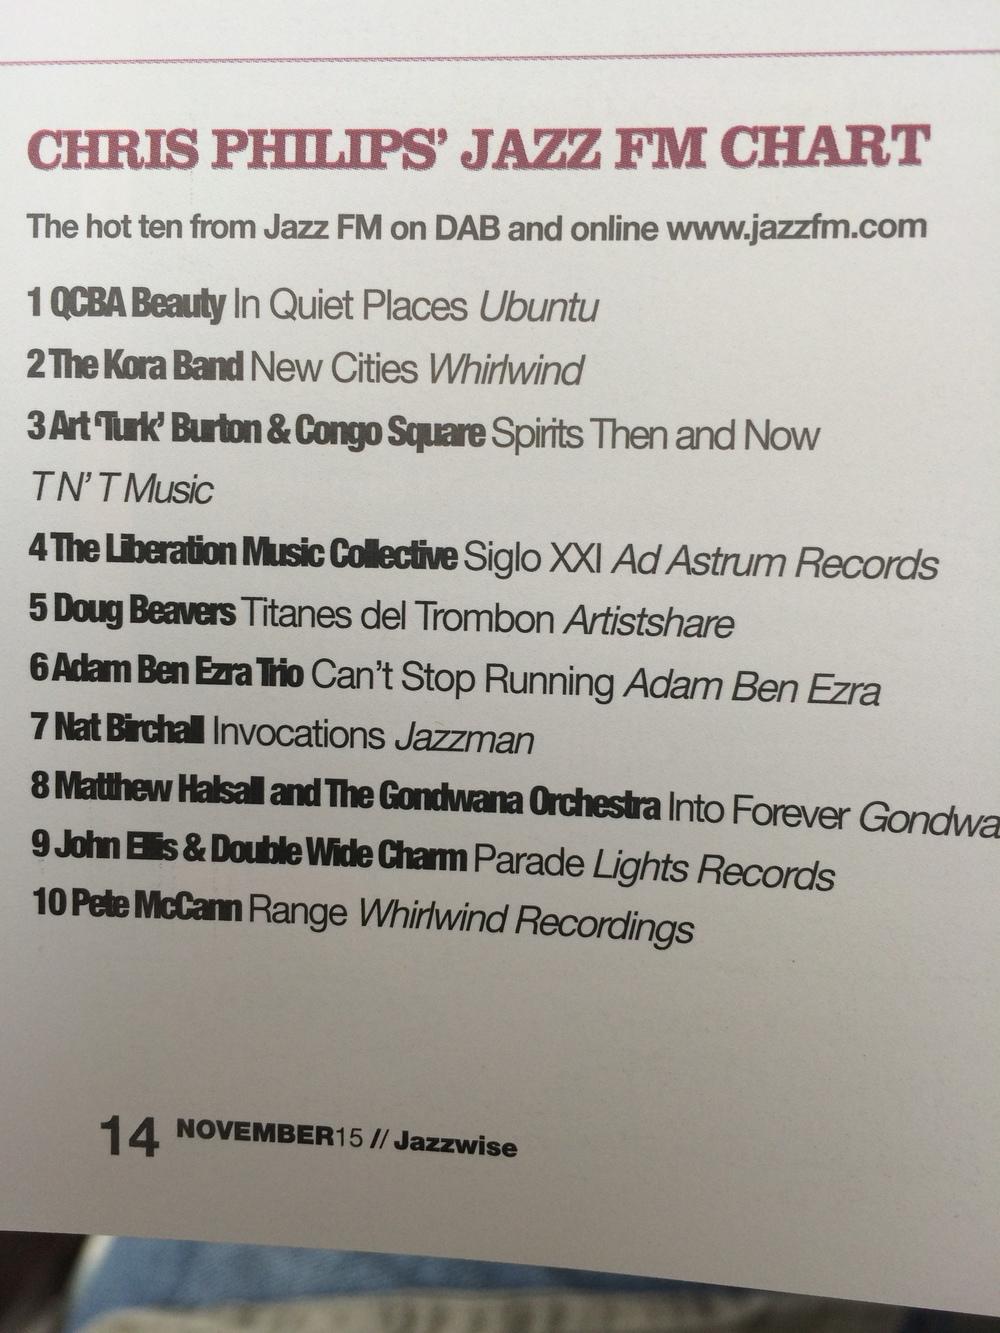 QCBA BIQP Jazzwise Charting_JazzFM 11.15.JPG